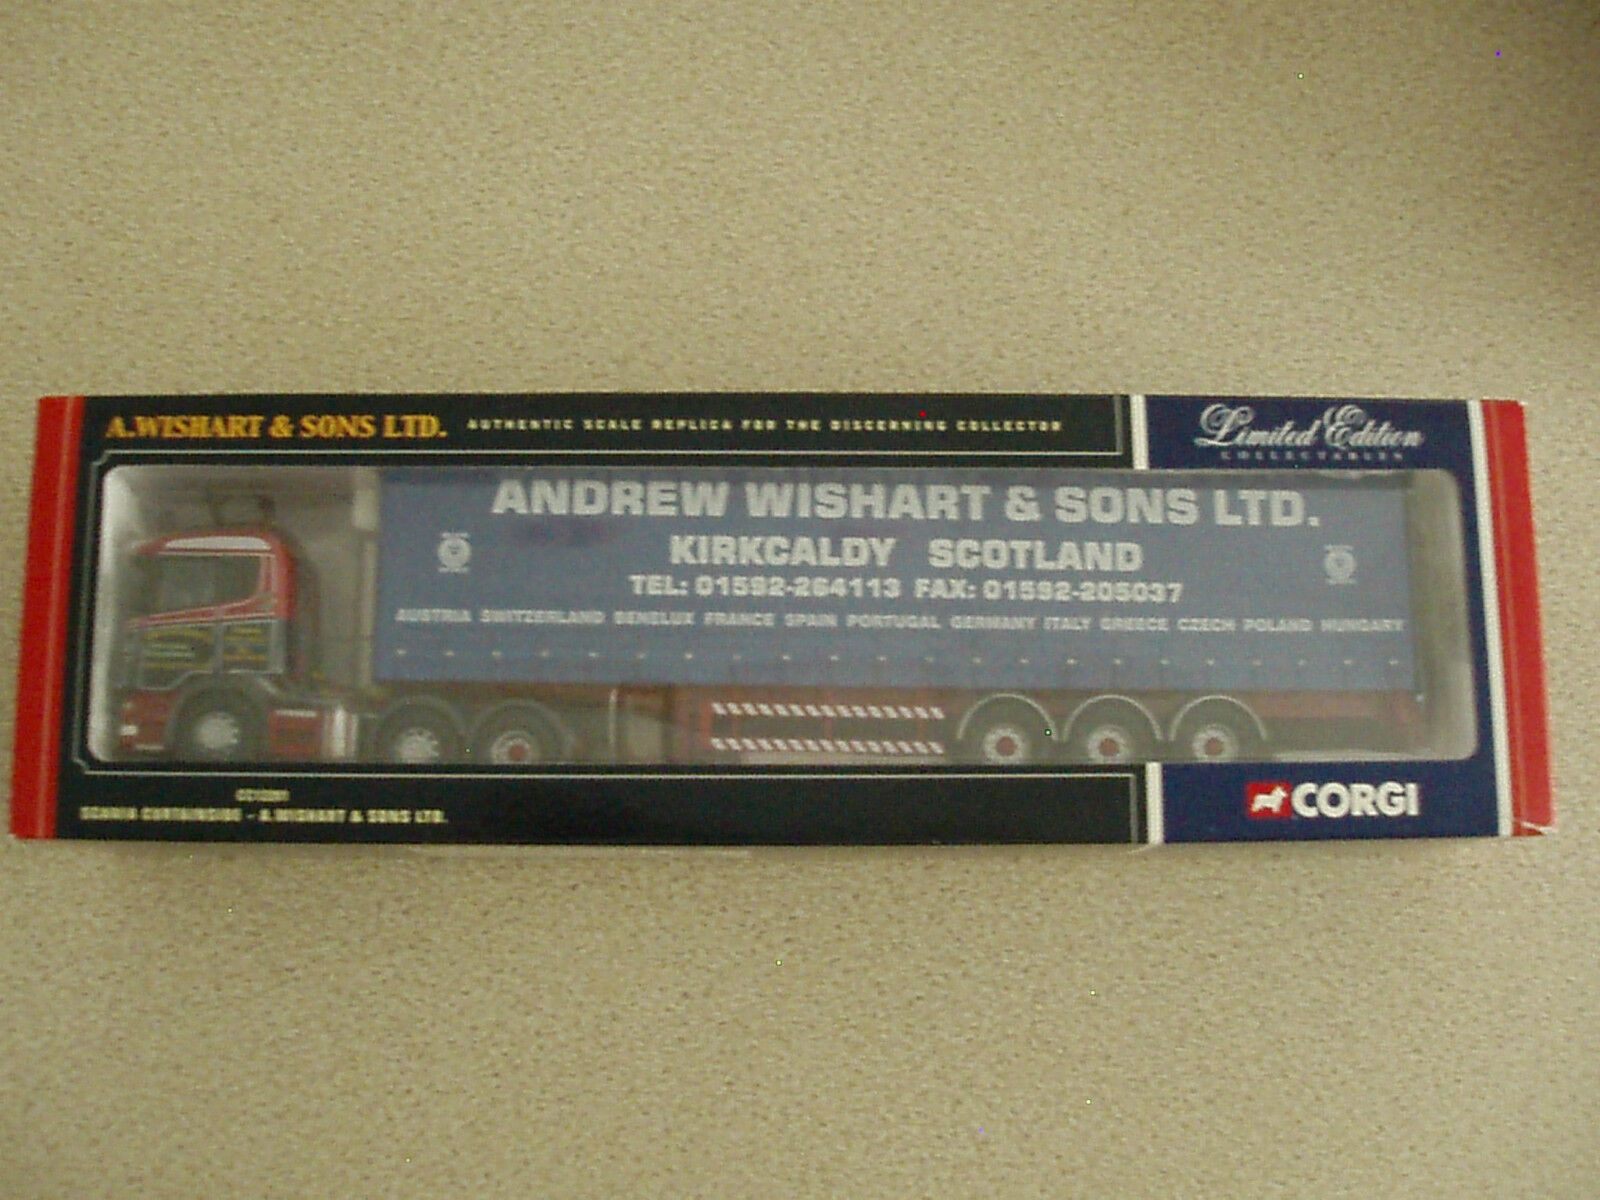 Corgi 1 50 Ltd Edn CC12201 Scania Curtainside A. Wishart & Sons Ltd Unused